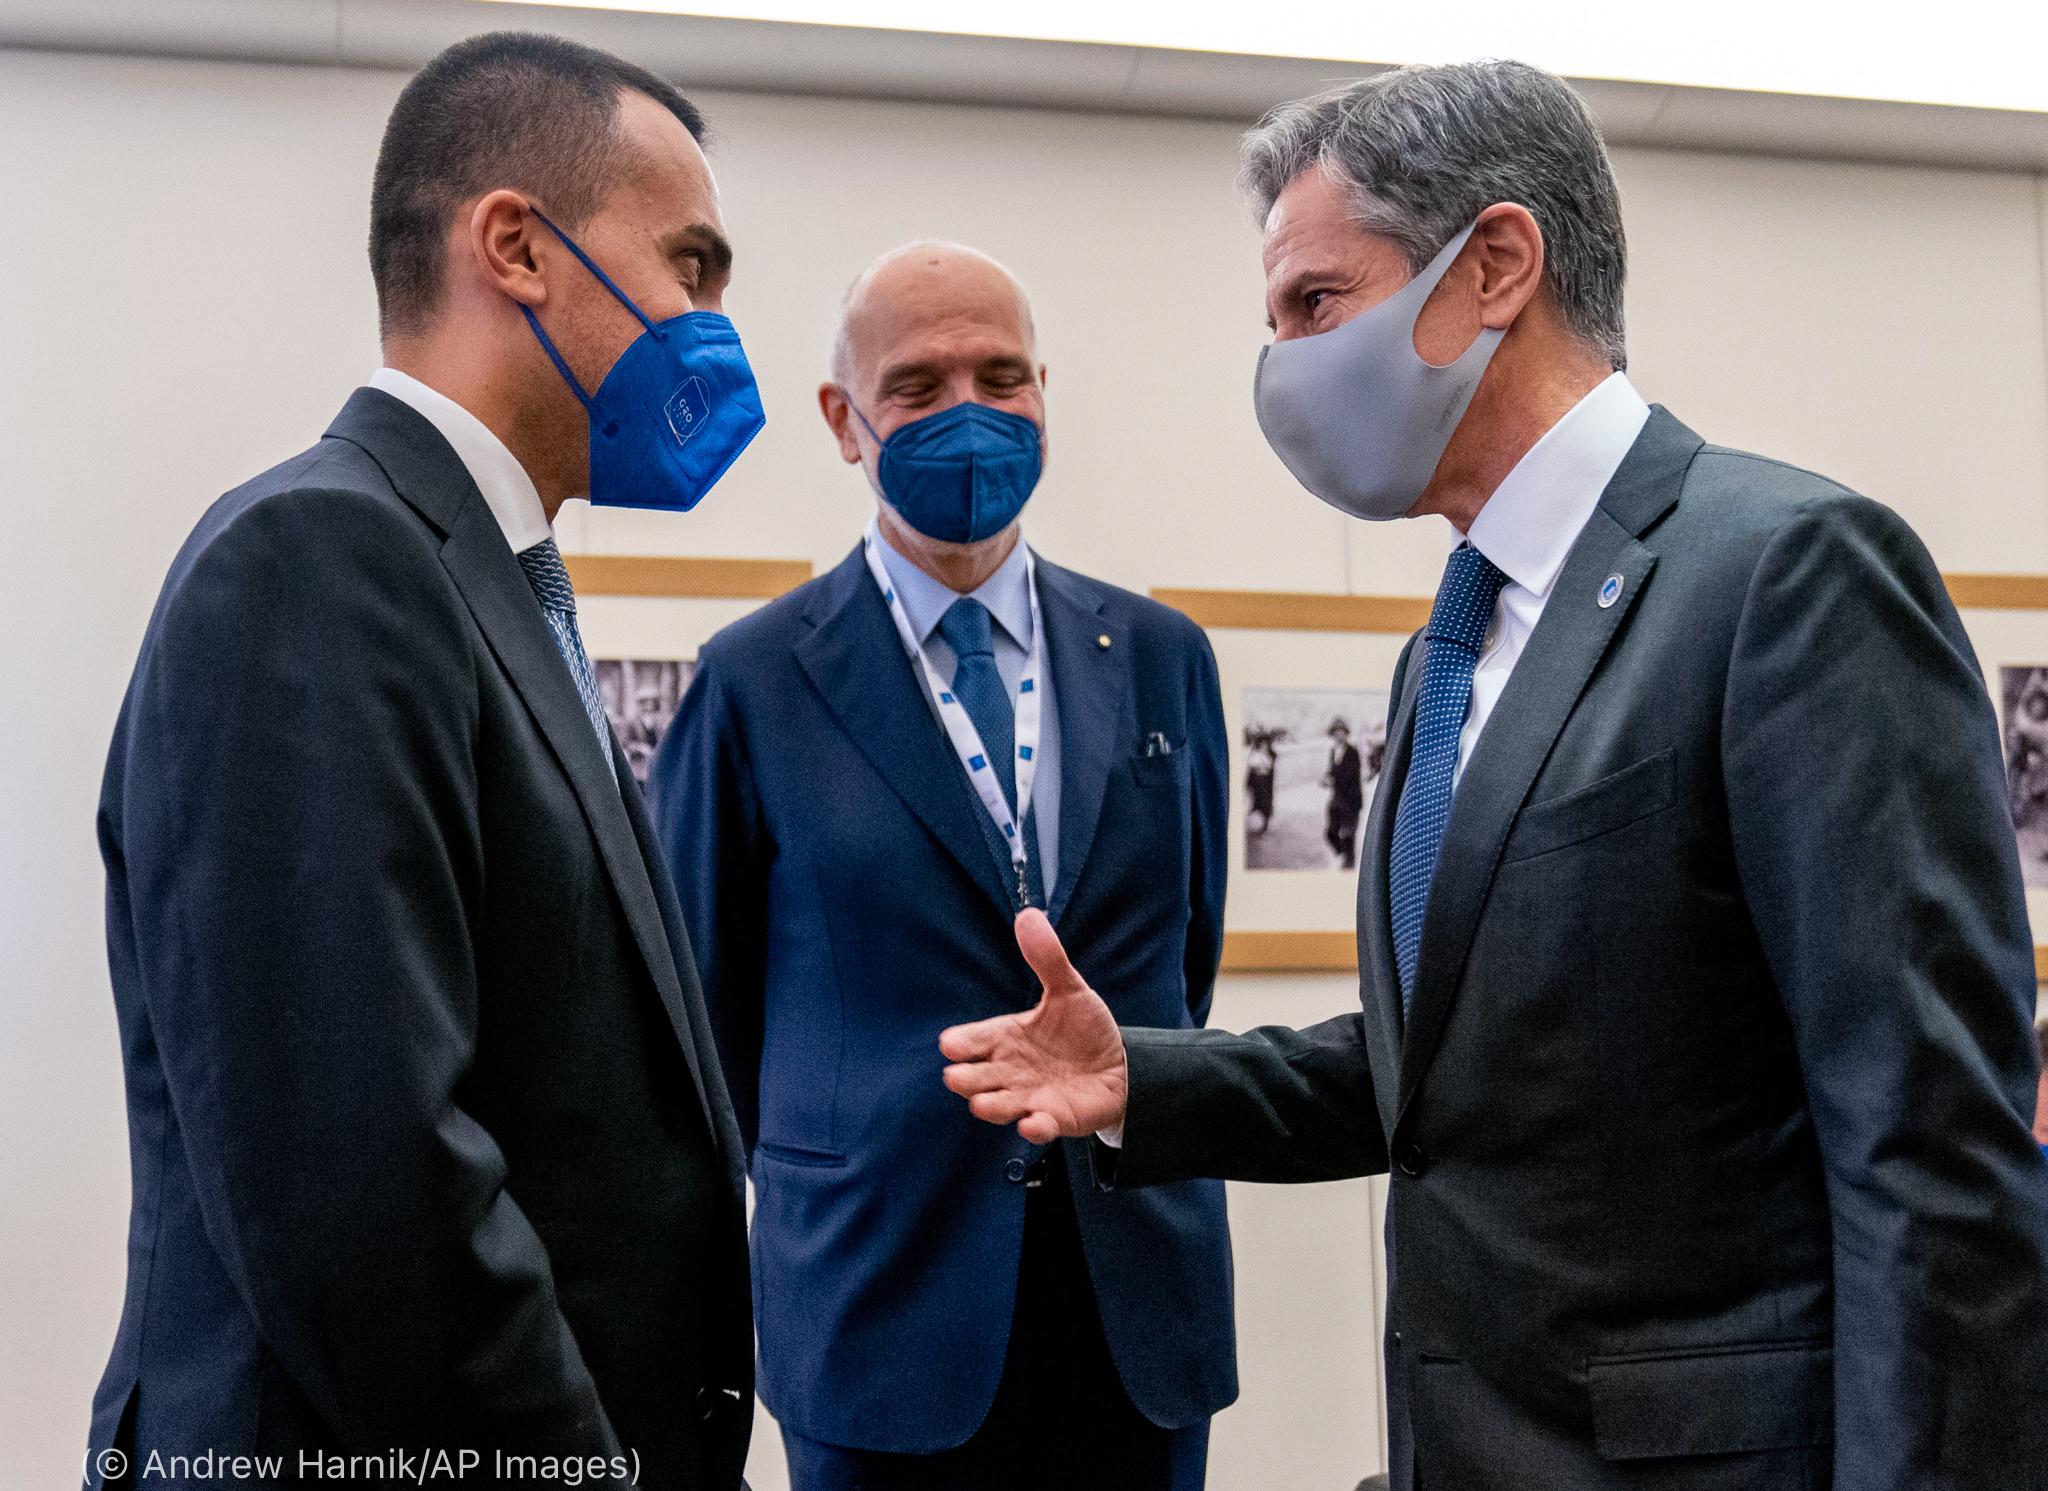 Antony Blinken en train de discuter avec deux hommes (© Andrew Harnik/AP Images)